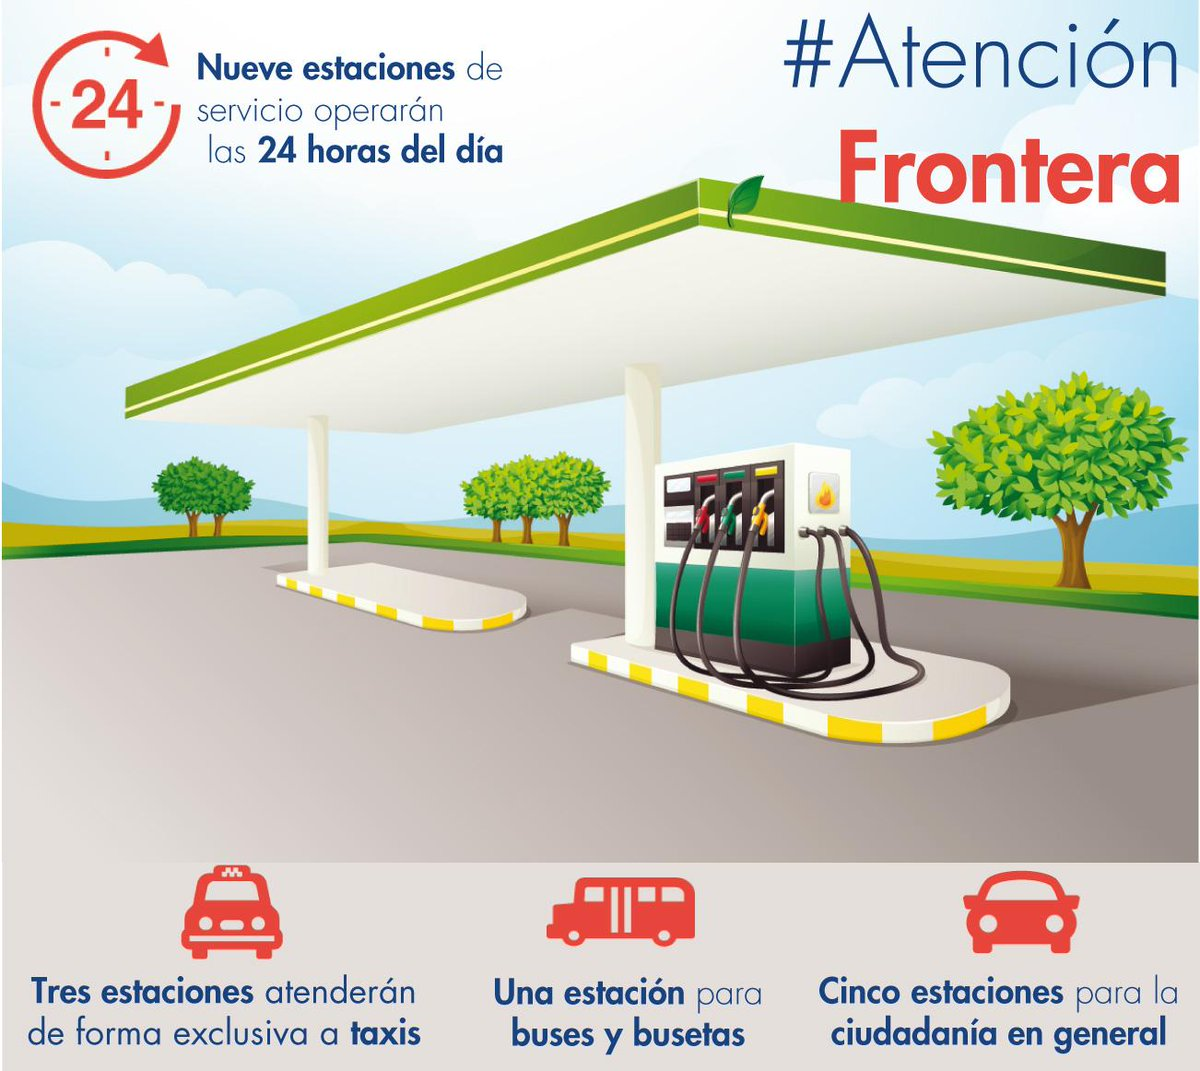 Se han tomado medidas necesarias para garantizar abastecimiento de combustible #NorteDeSantander #AtenciónFrontera http://t.co/ZY8FpA6gtB